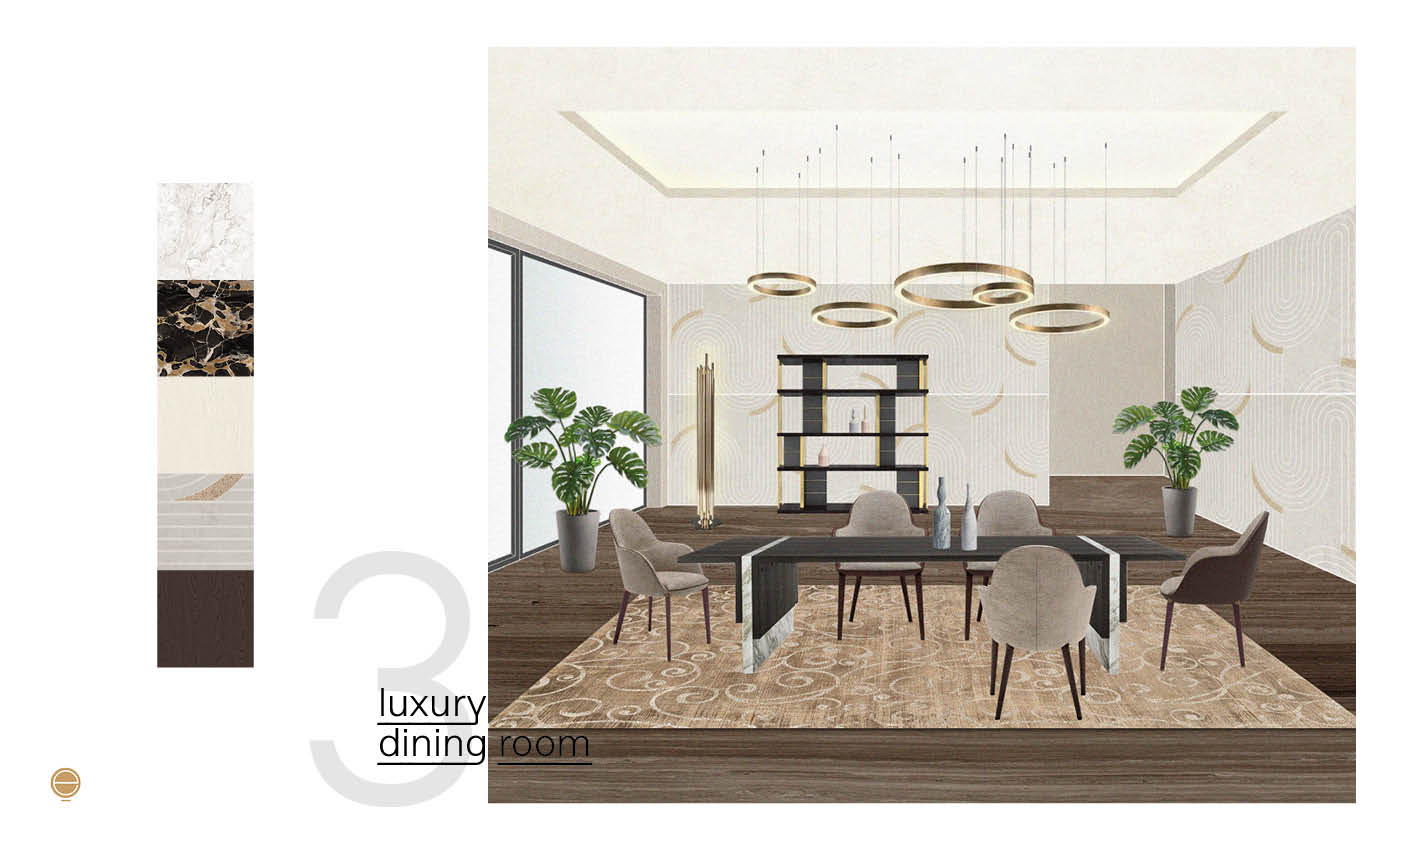 elegant and luxury dining room design made by Esperiri Milano